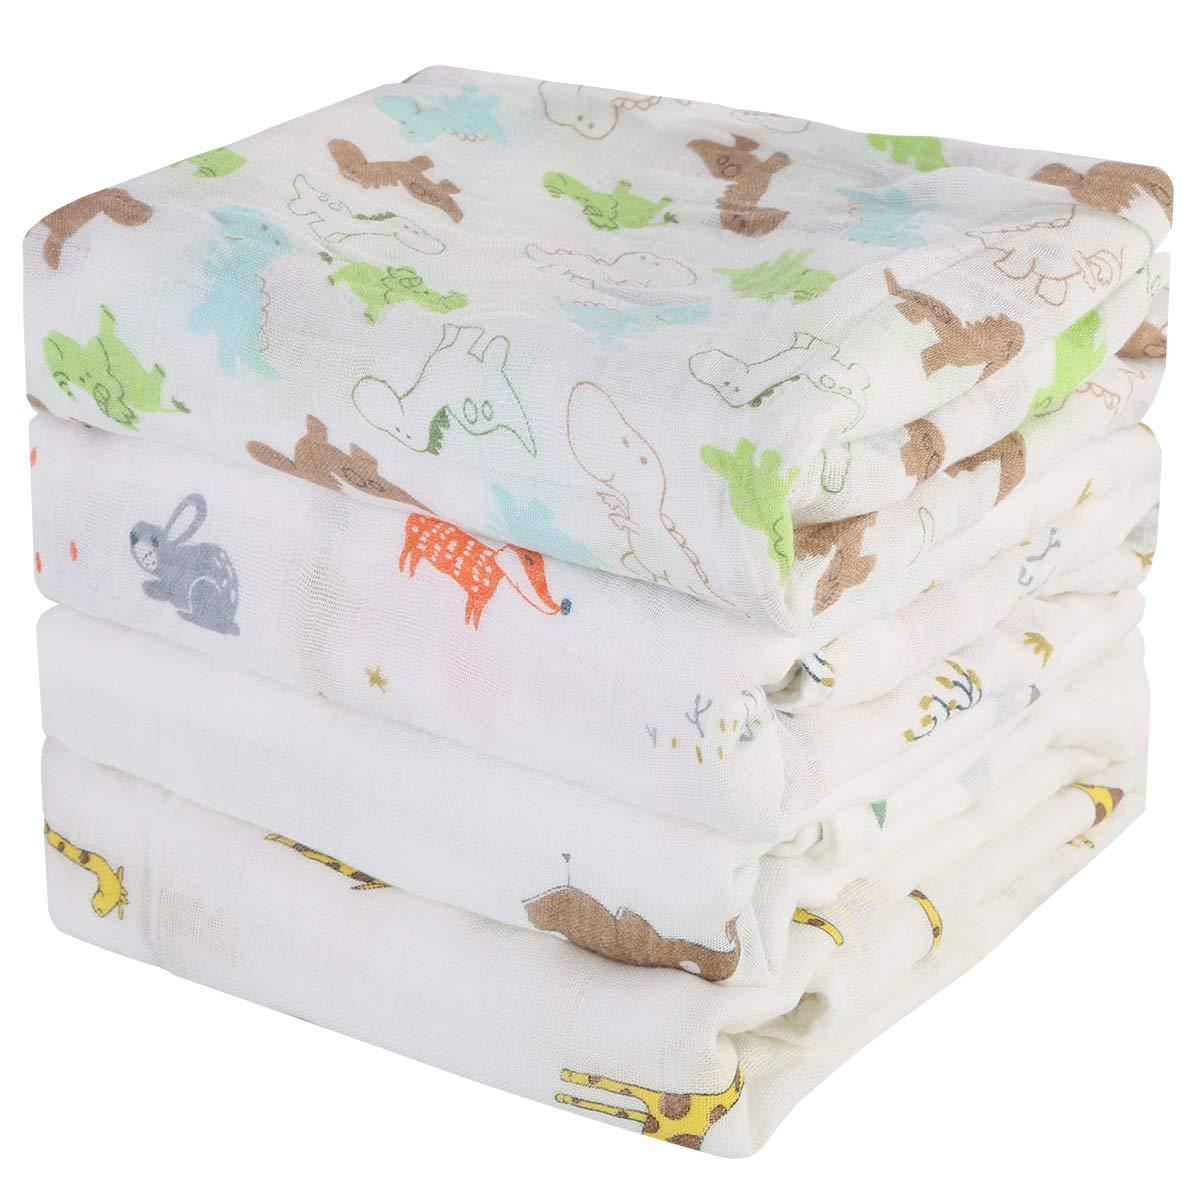 4PC Baby Swaddle Blanket Cartoon Animal Print Newborn Soft Receiving Blanket Wrap Multifunctional Baby Bath Towel for Boys Girls